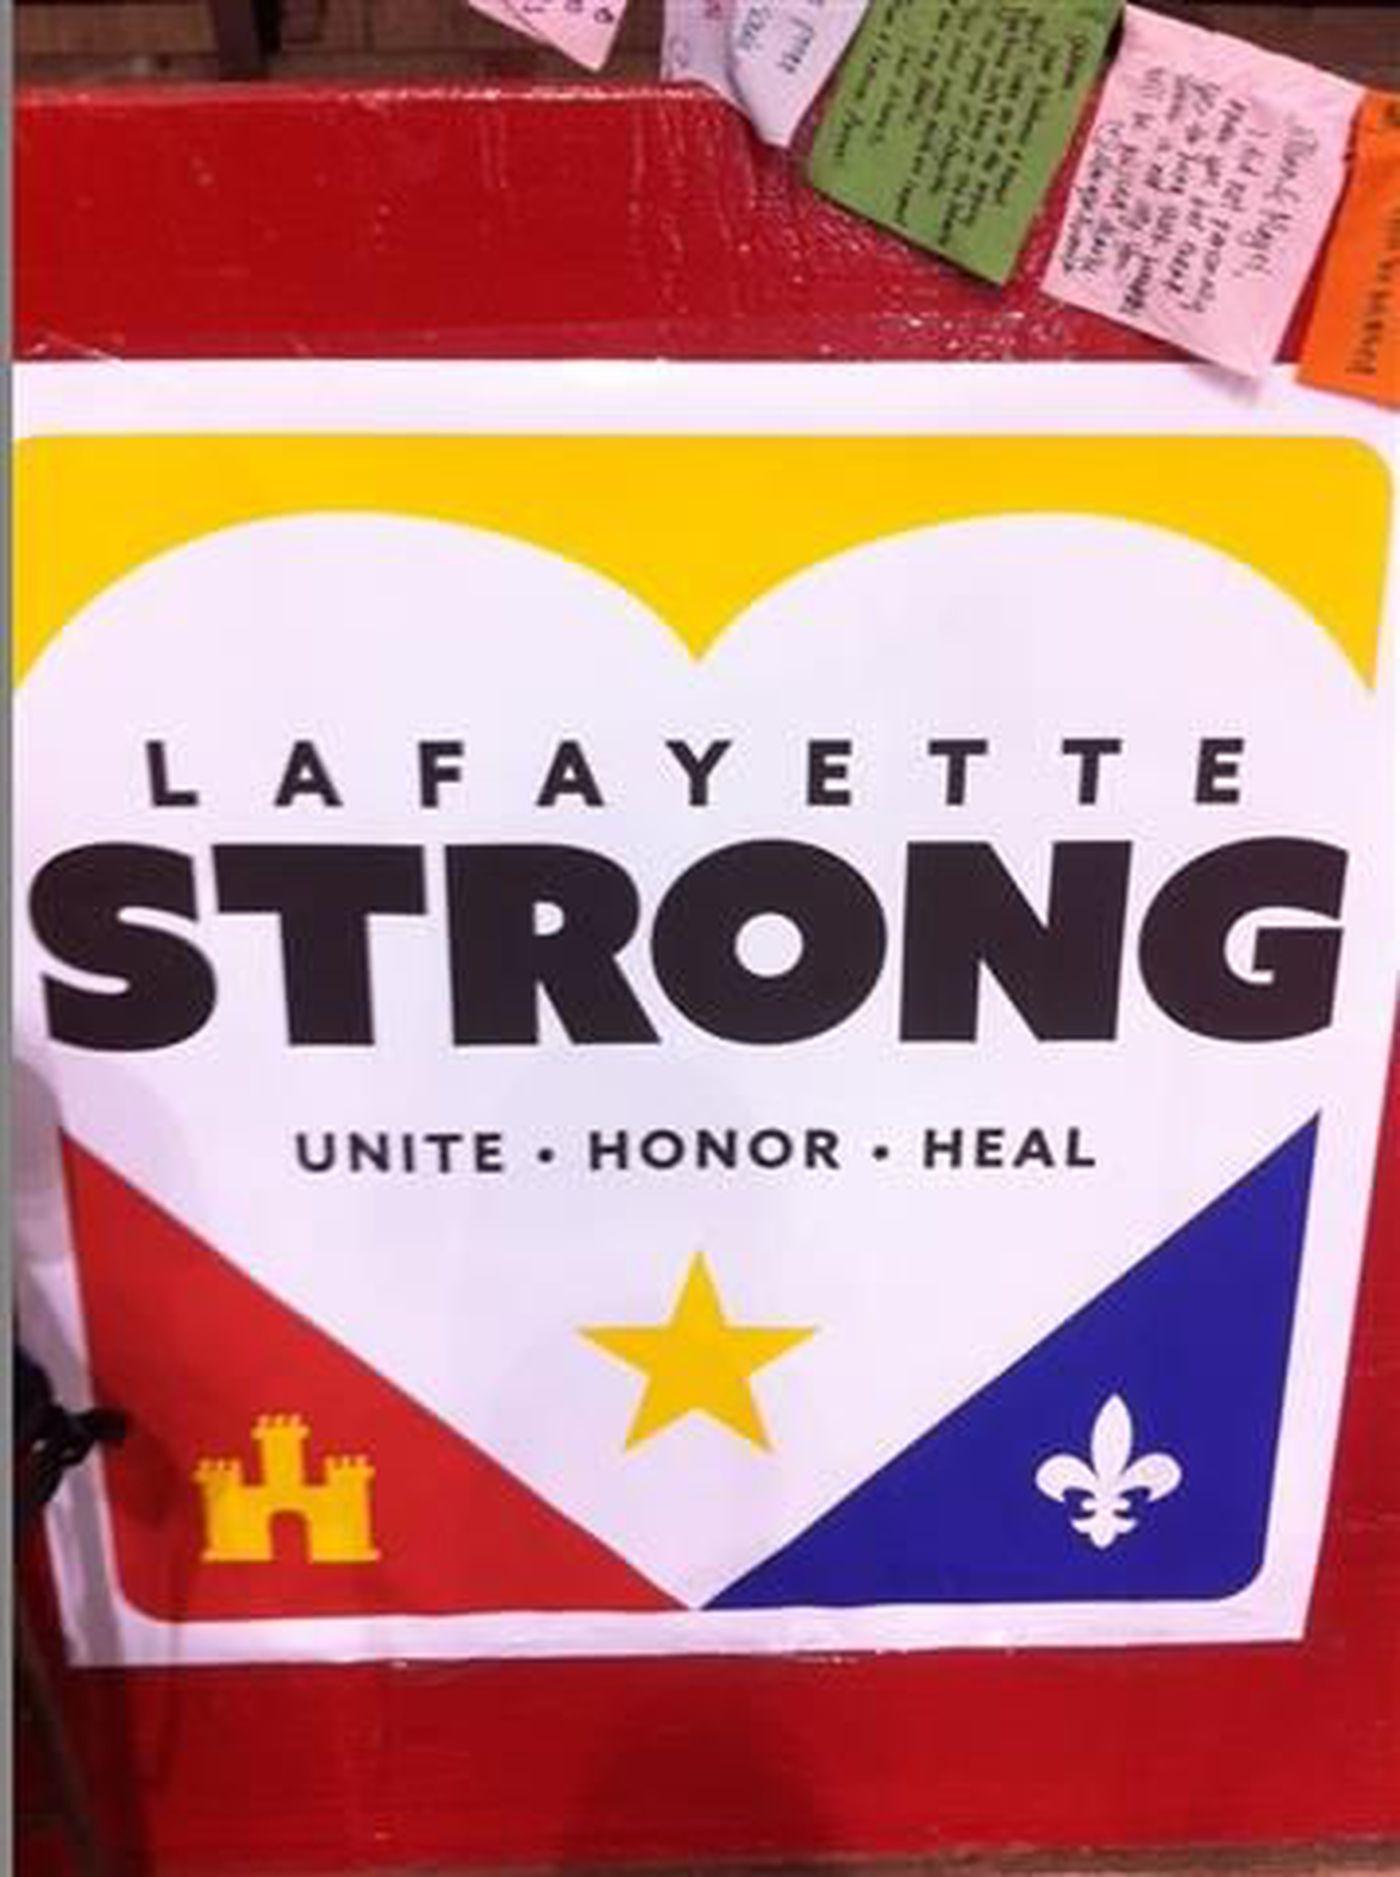 2abdda3963bdce Lafayette Strong Unite Honor Heal Helps Munity Move Forward. Acadian Flag  Rod Romero